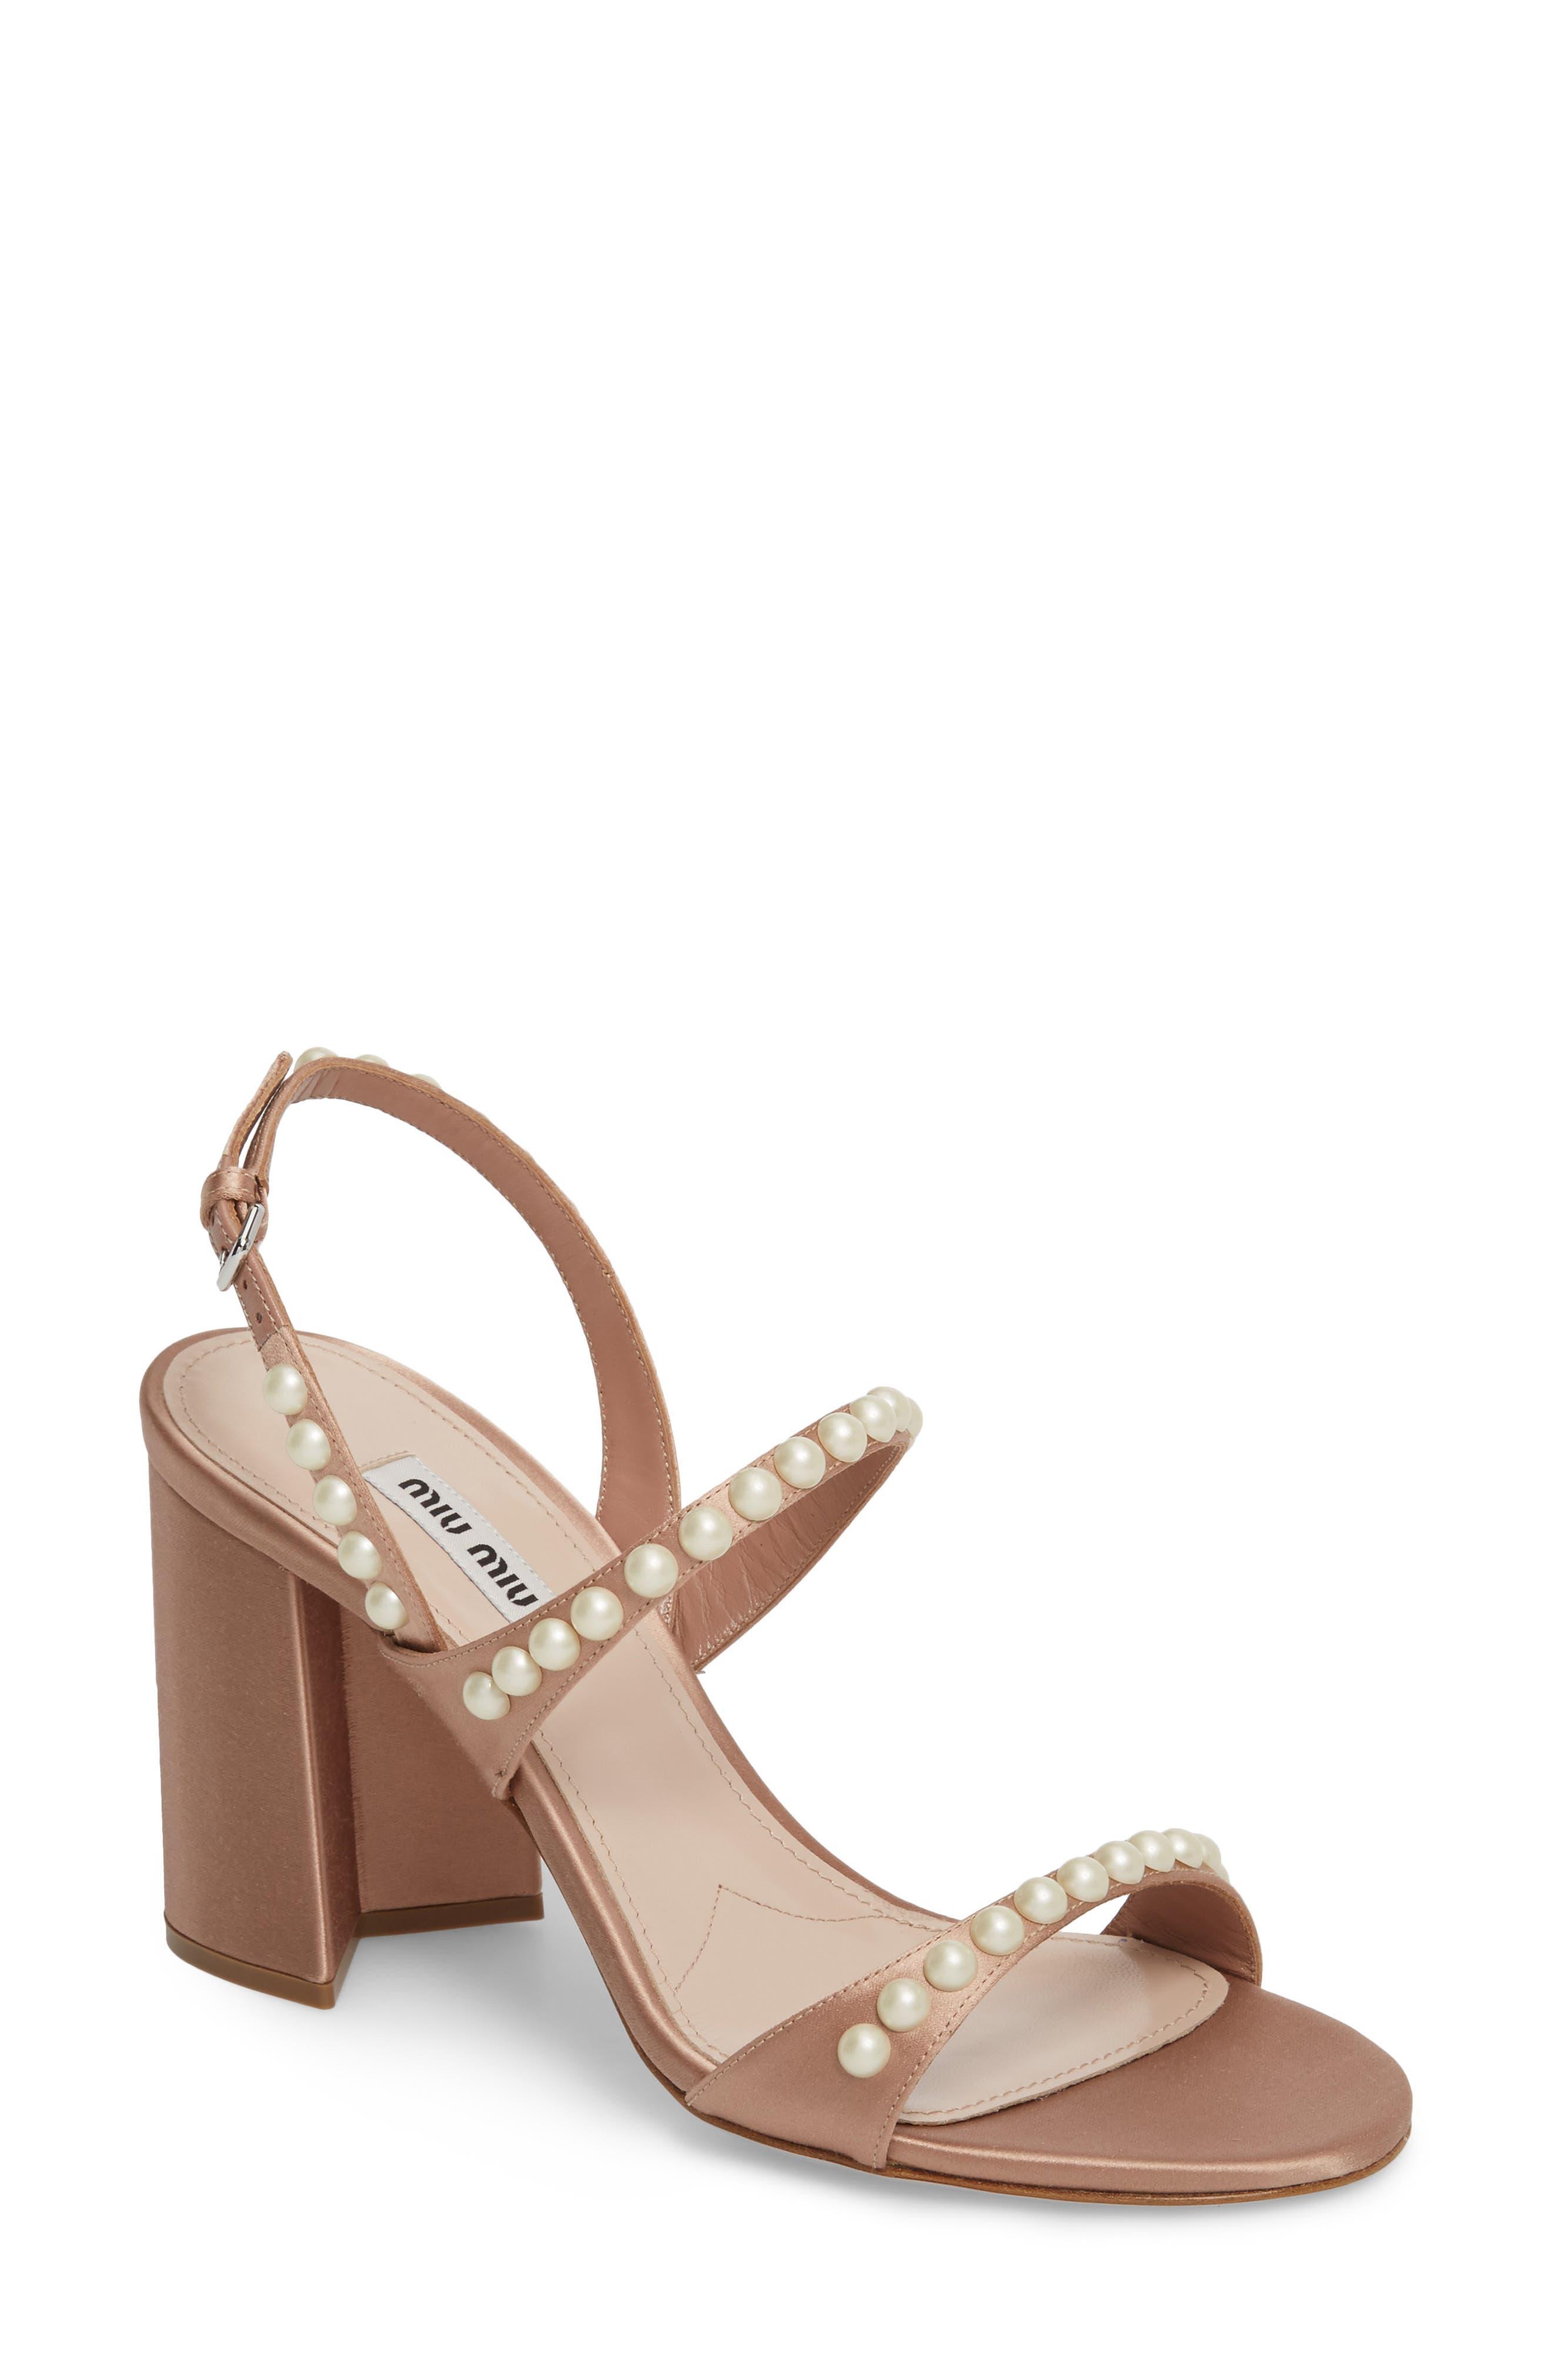 Imitation Pearl Slingback Sandal,                         Main,                         color,